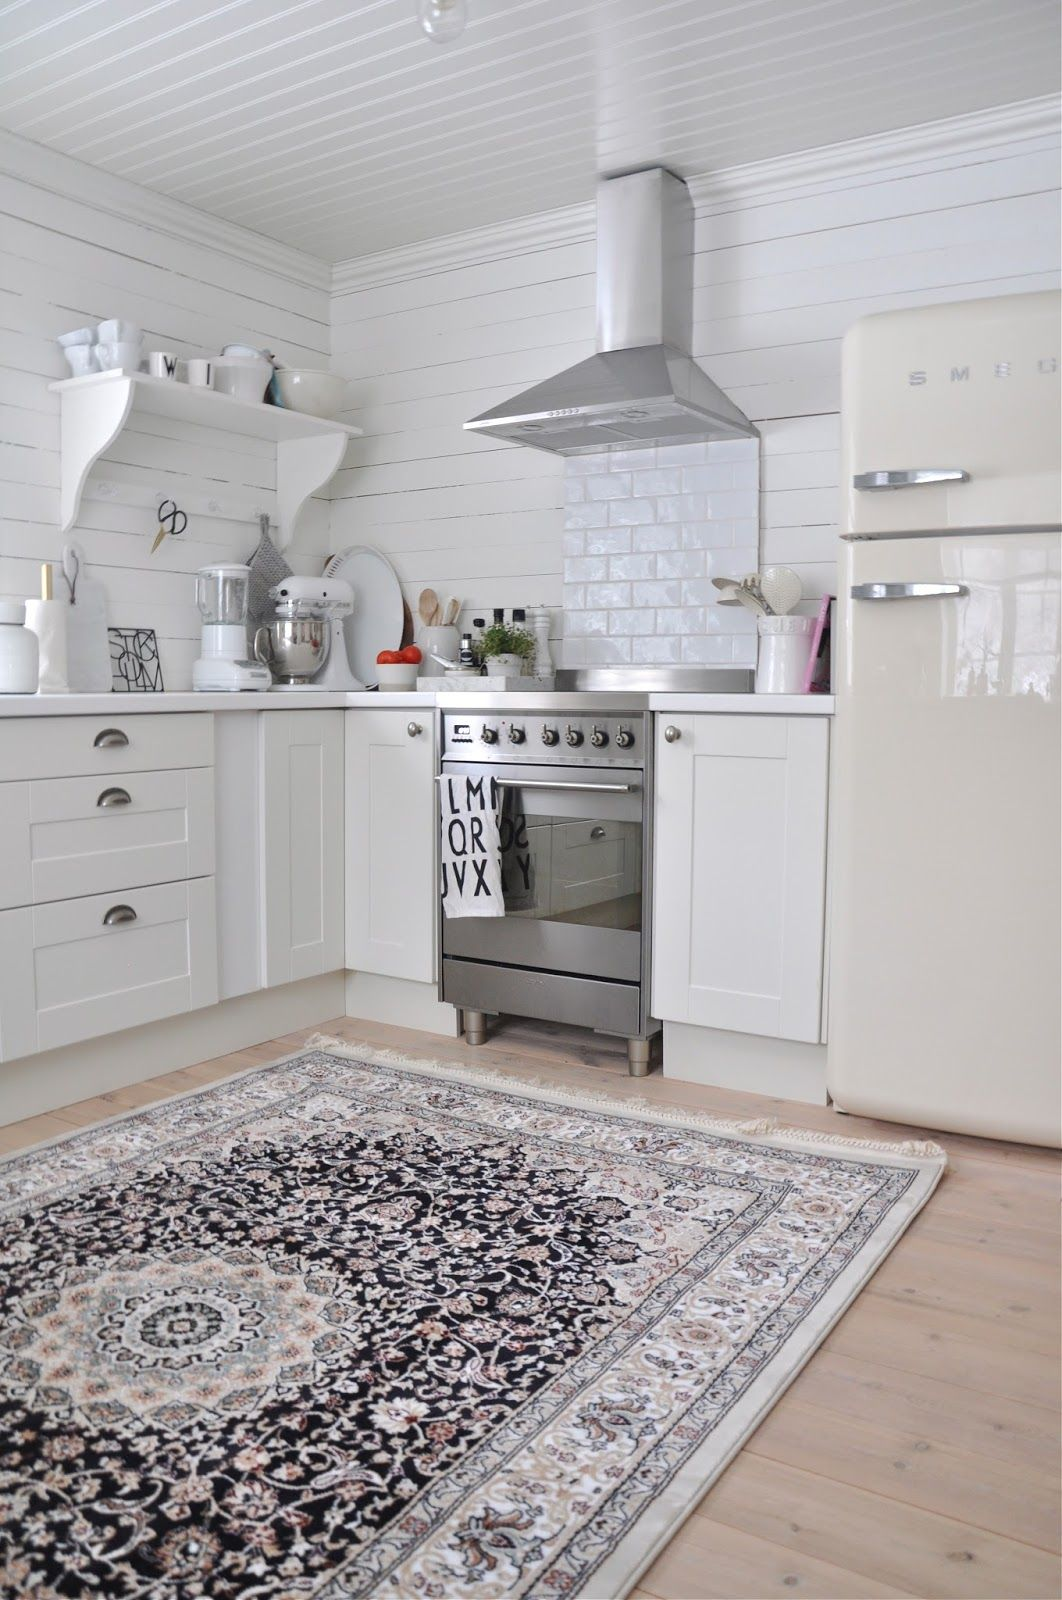 antique rug + ivory smeg fridge | cucina | Cucine